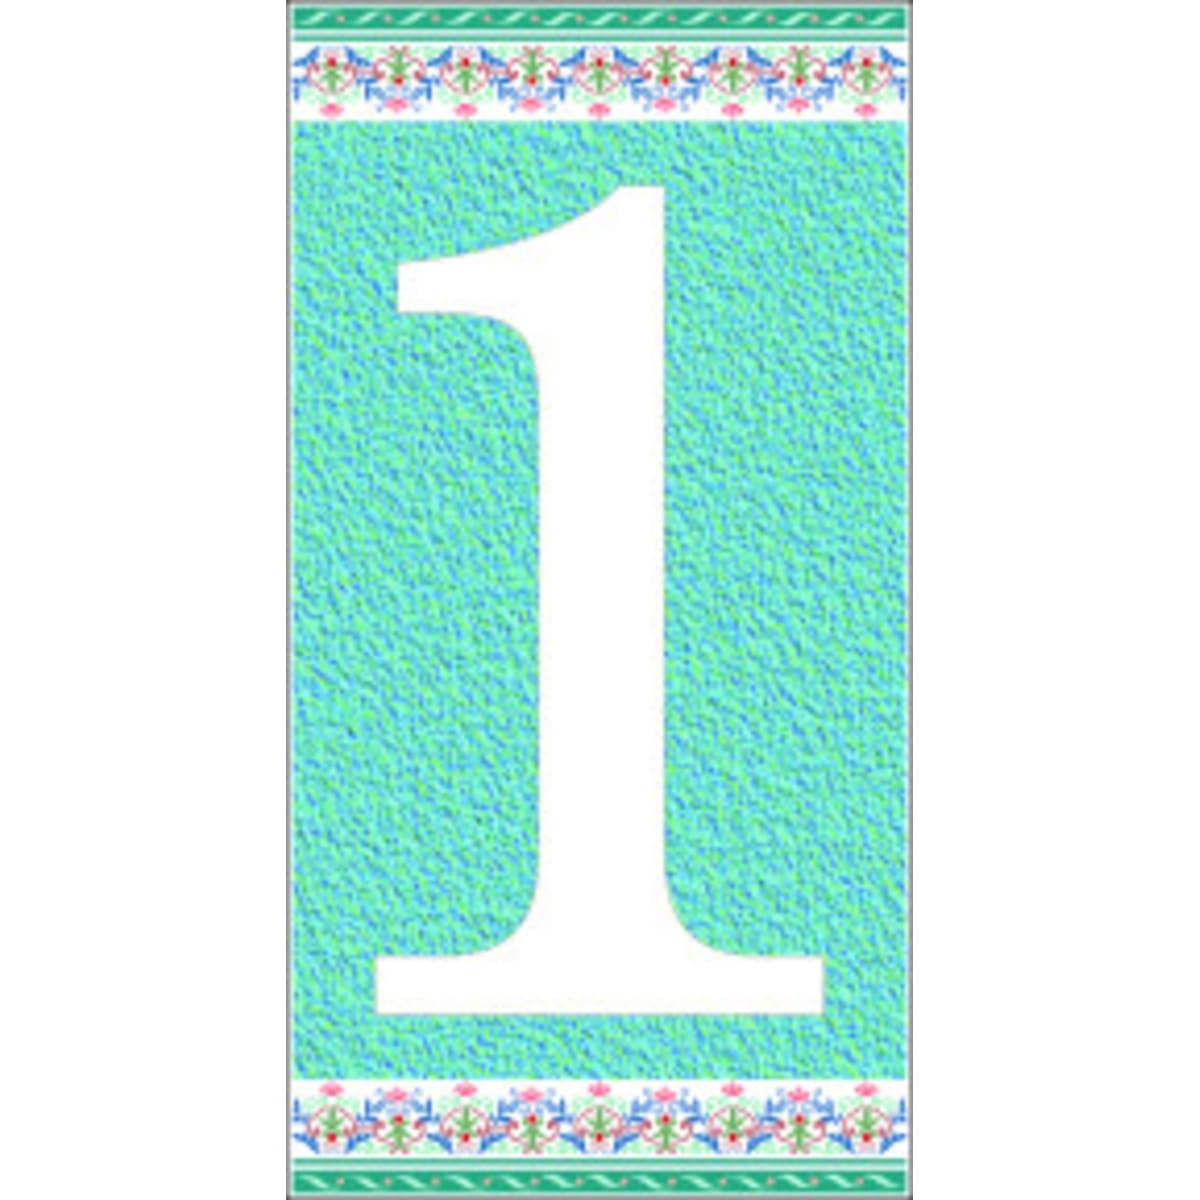 Цифра «1» самоклеящаяся 145x75 мм пенополиэтилен цвет глянцевый голубой